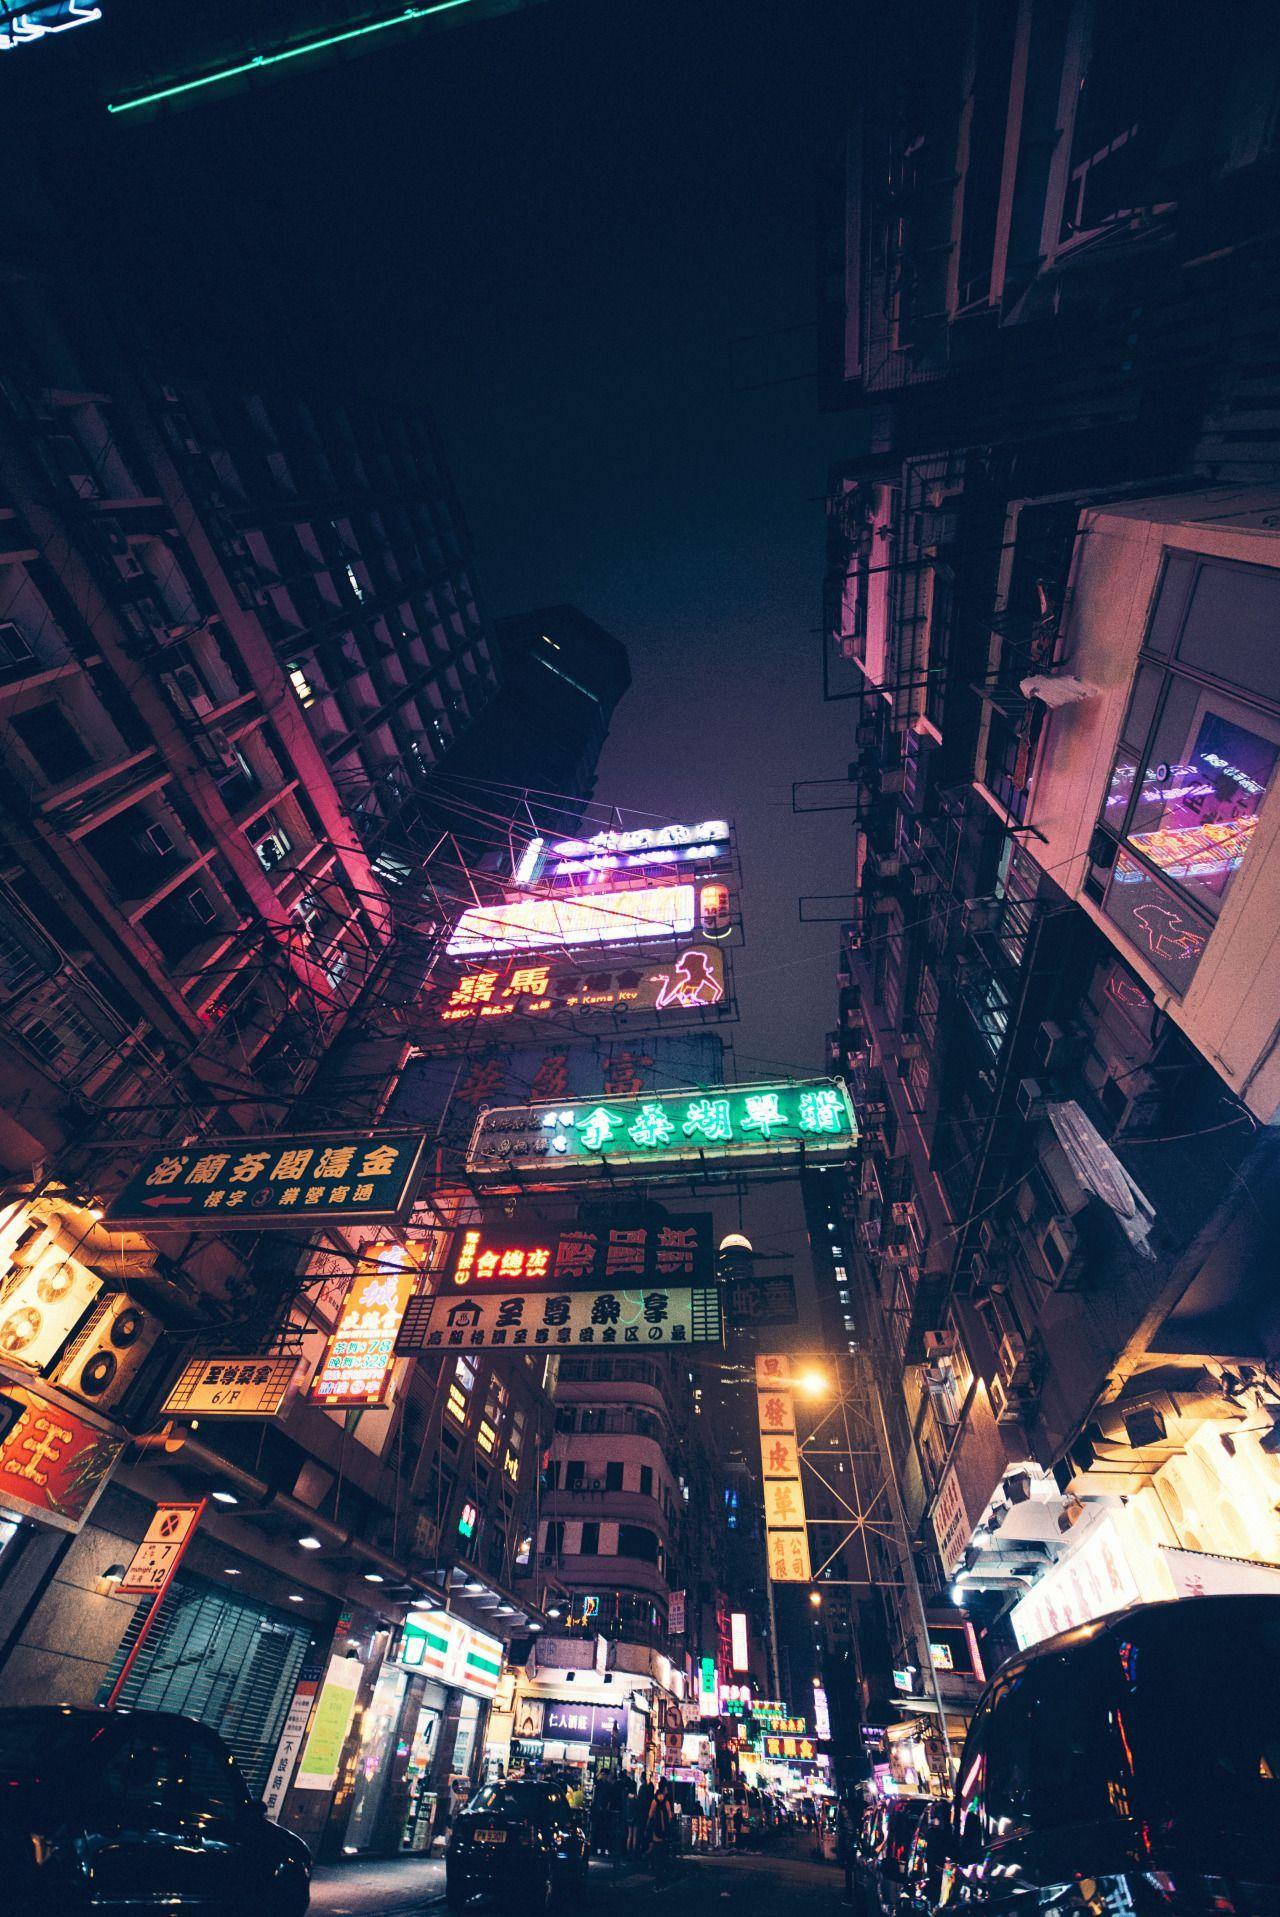 N I G H T L I F E City Aesthetic Neon Aesthetic Neon Nights